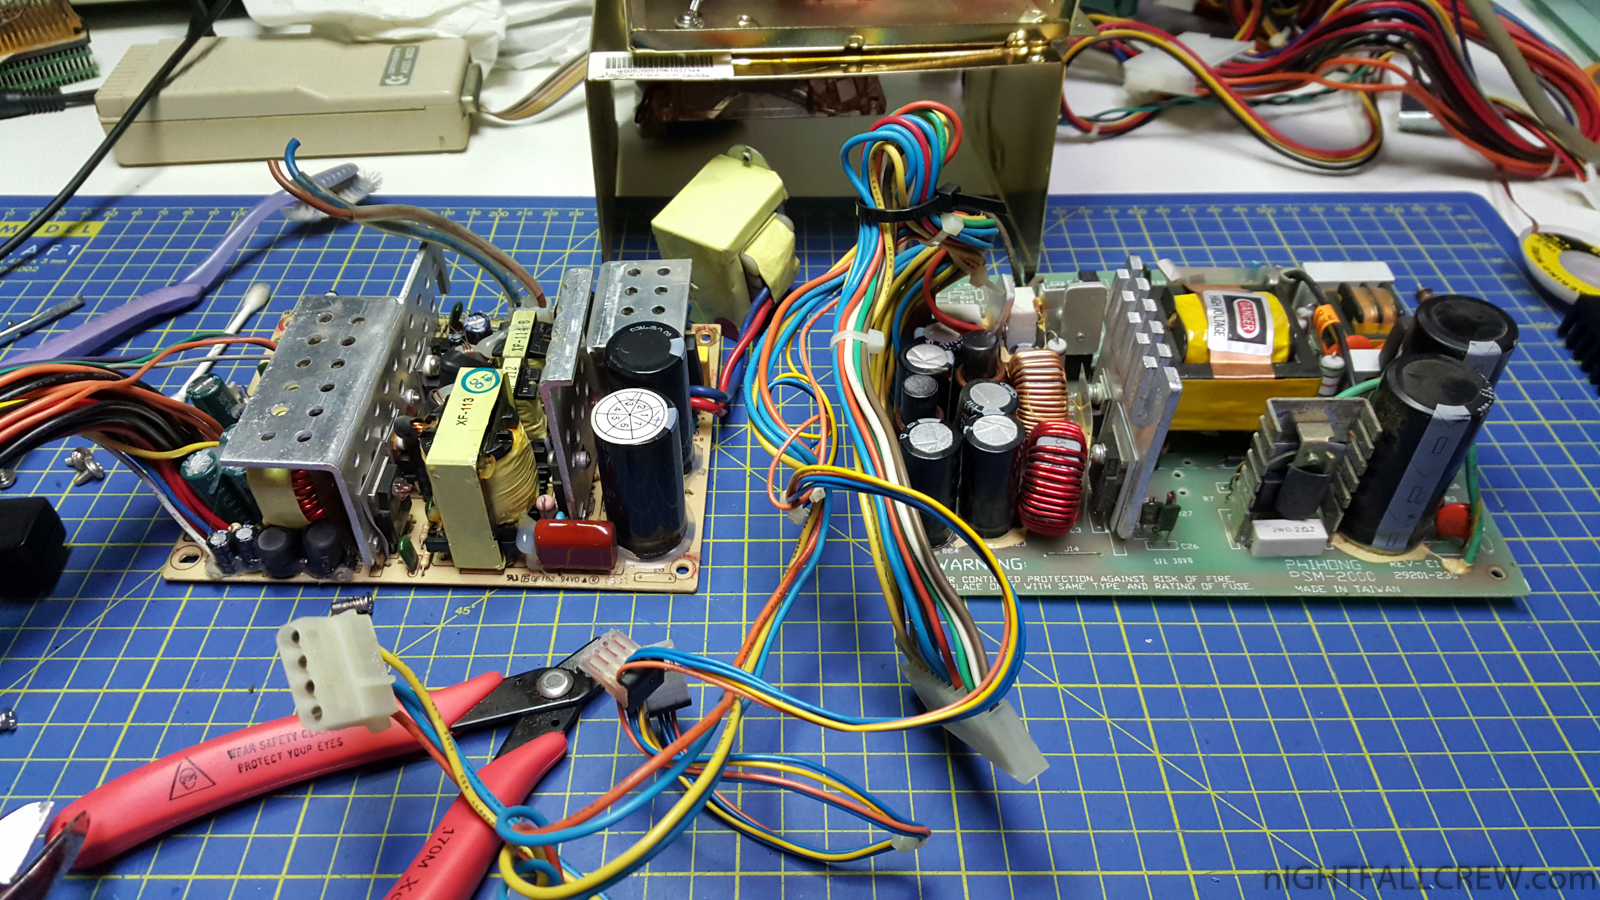 Commodore Amiga 2000 Psu Upgrade Nightfall Blog